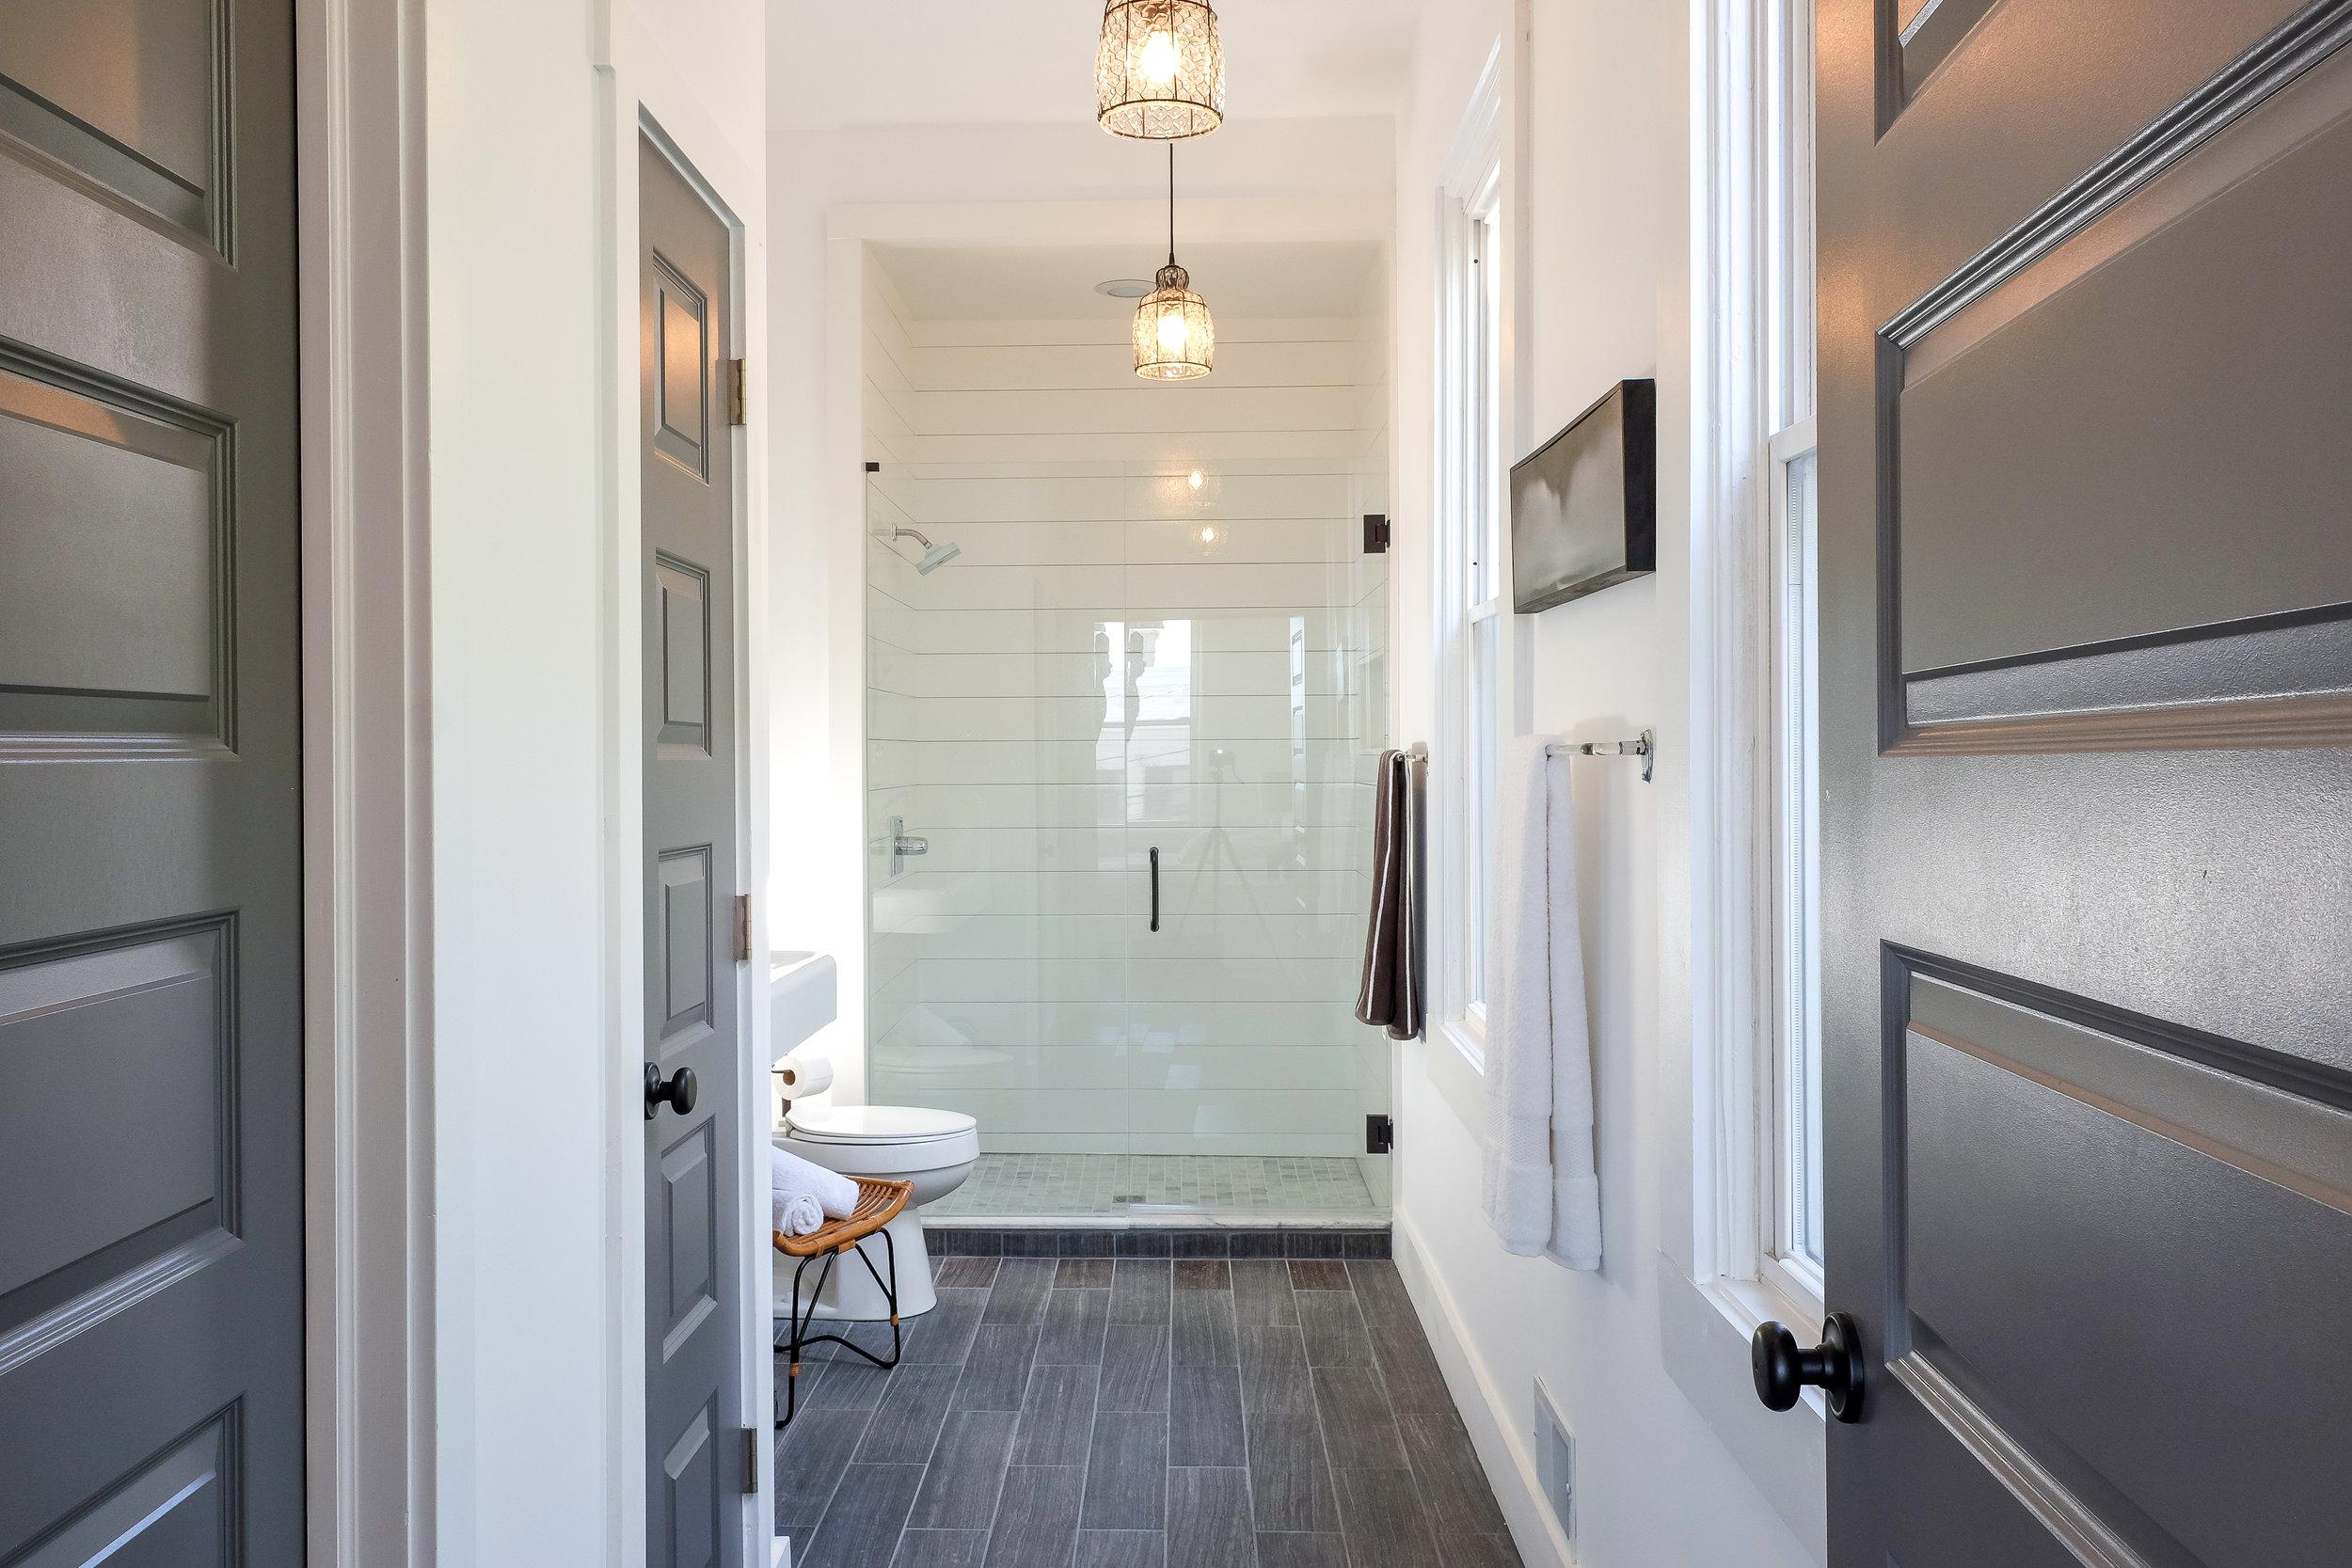 Shop The Shiplap Shower Master Bath Room